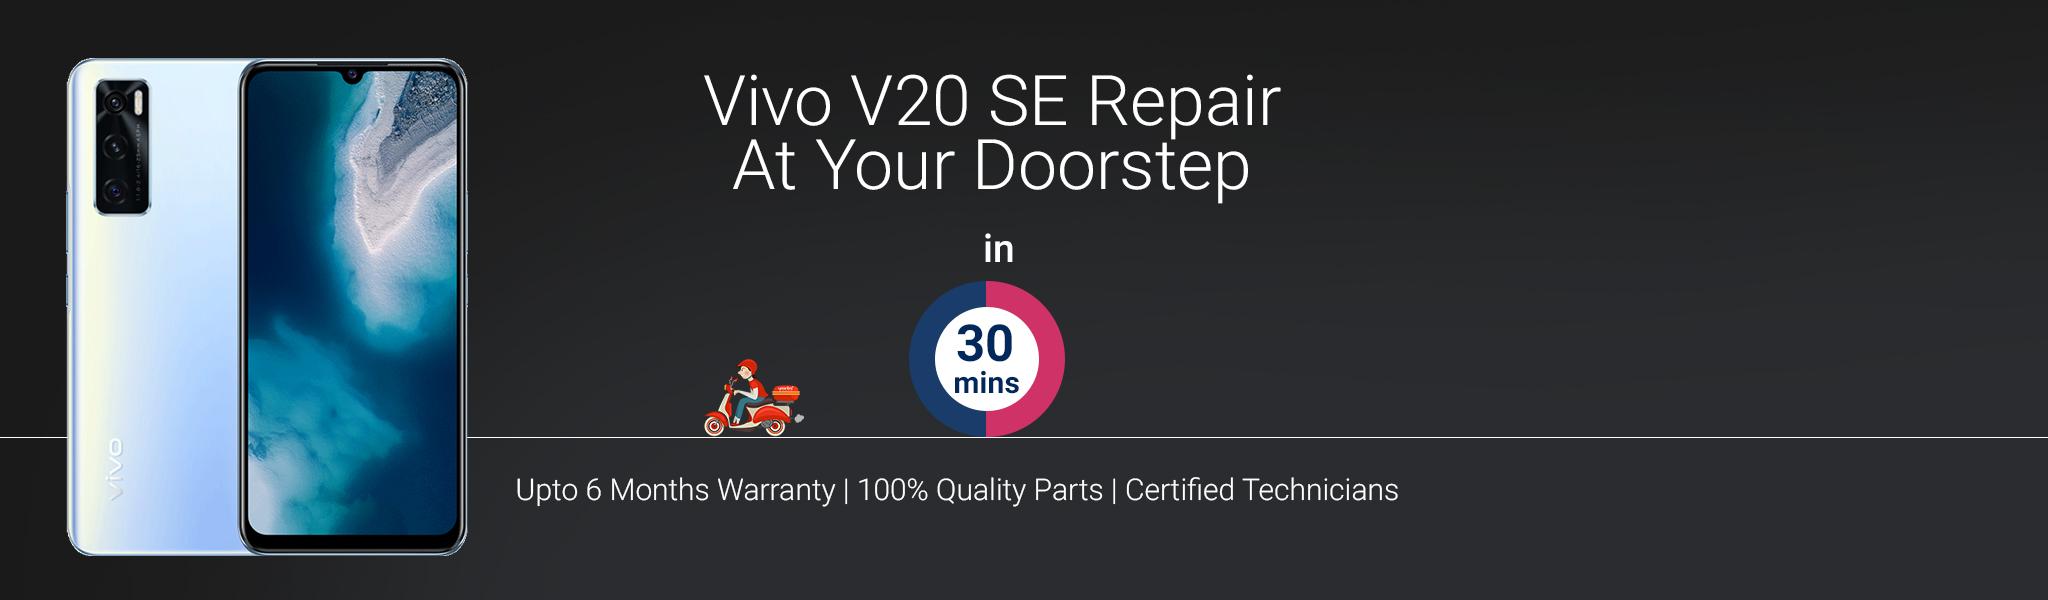 vivo-v20-se-repair.jpg